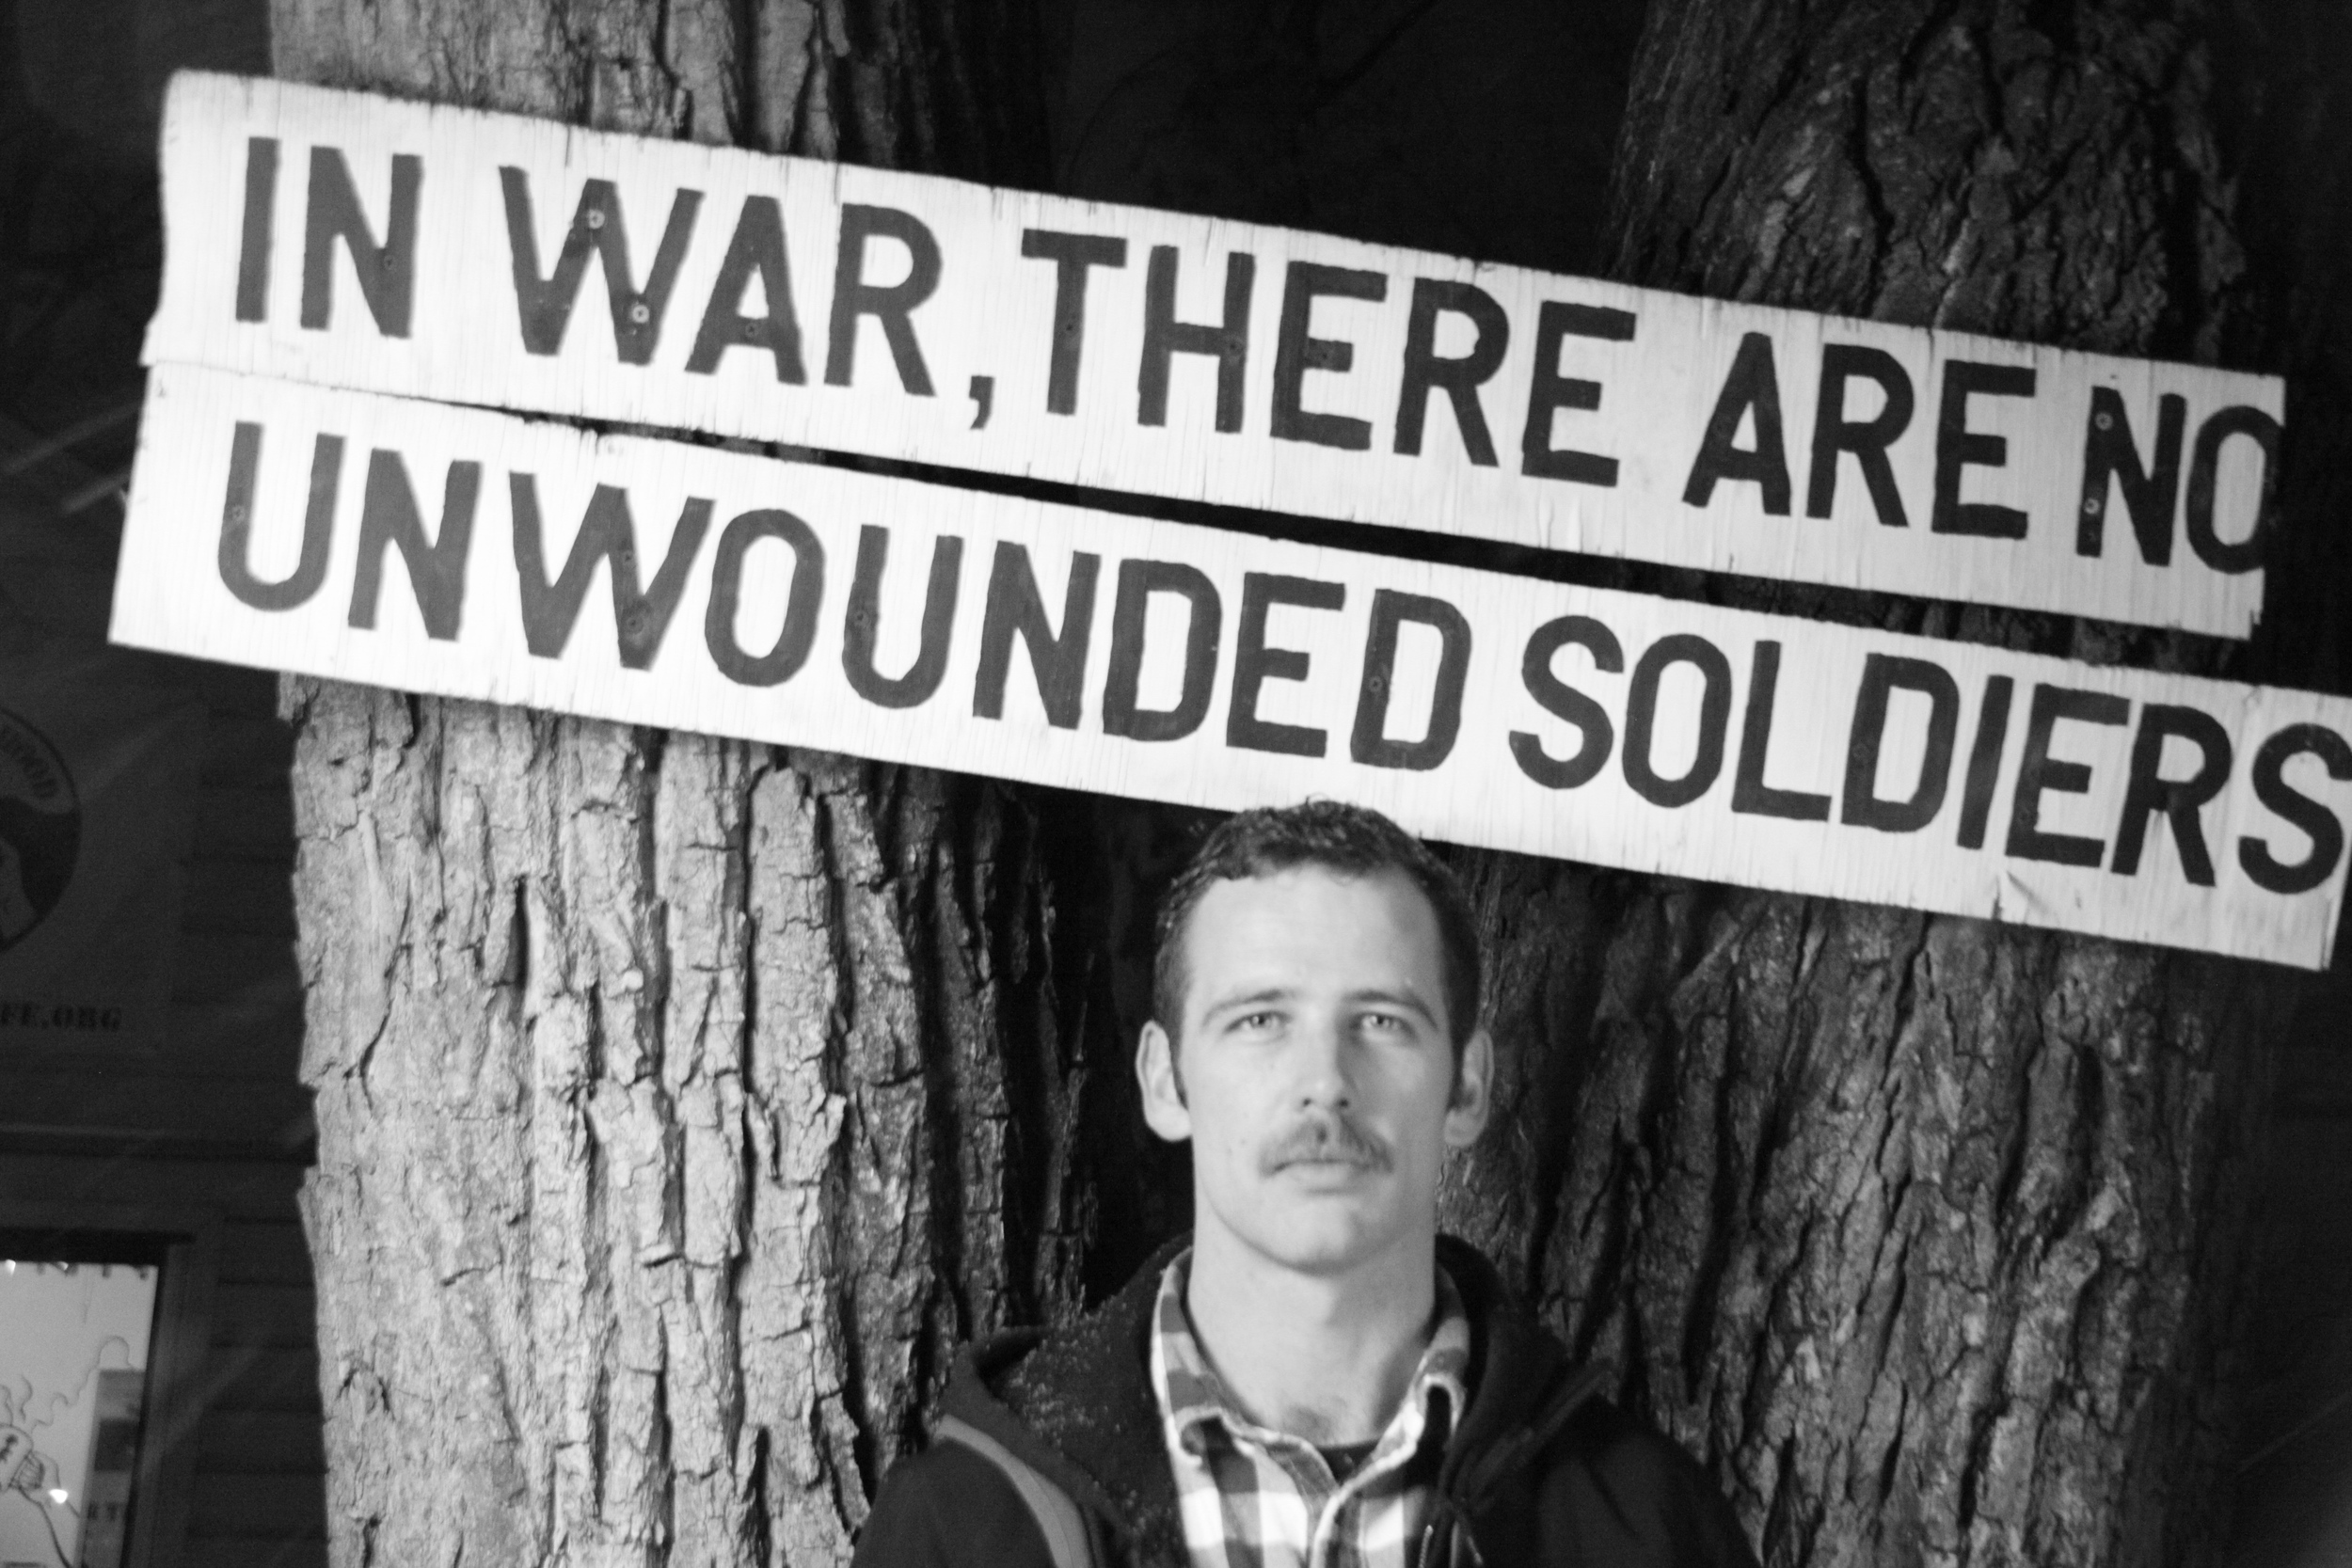 Ryan Holleran, U.S. Army Veteran